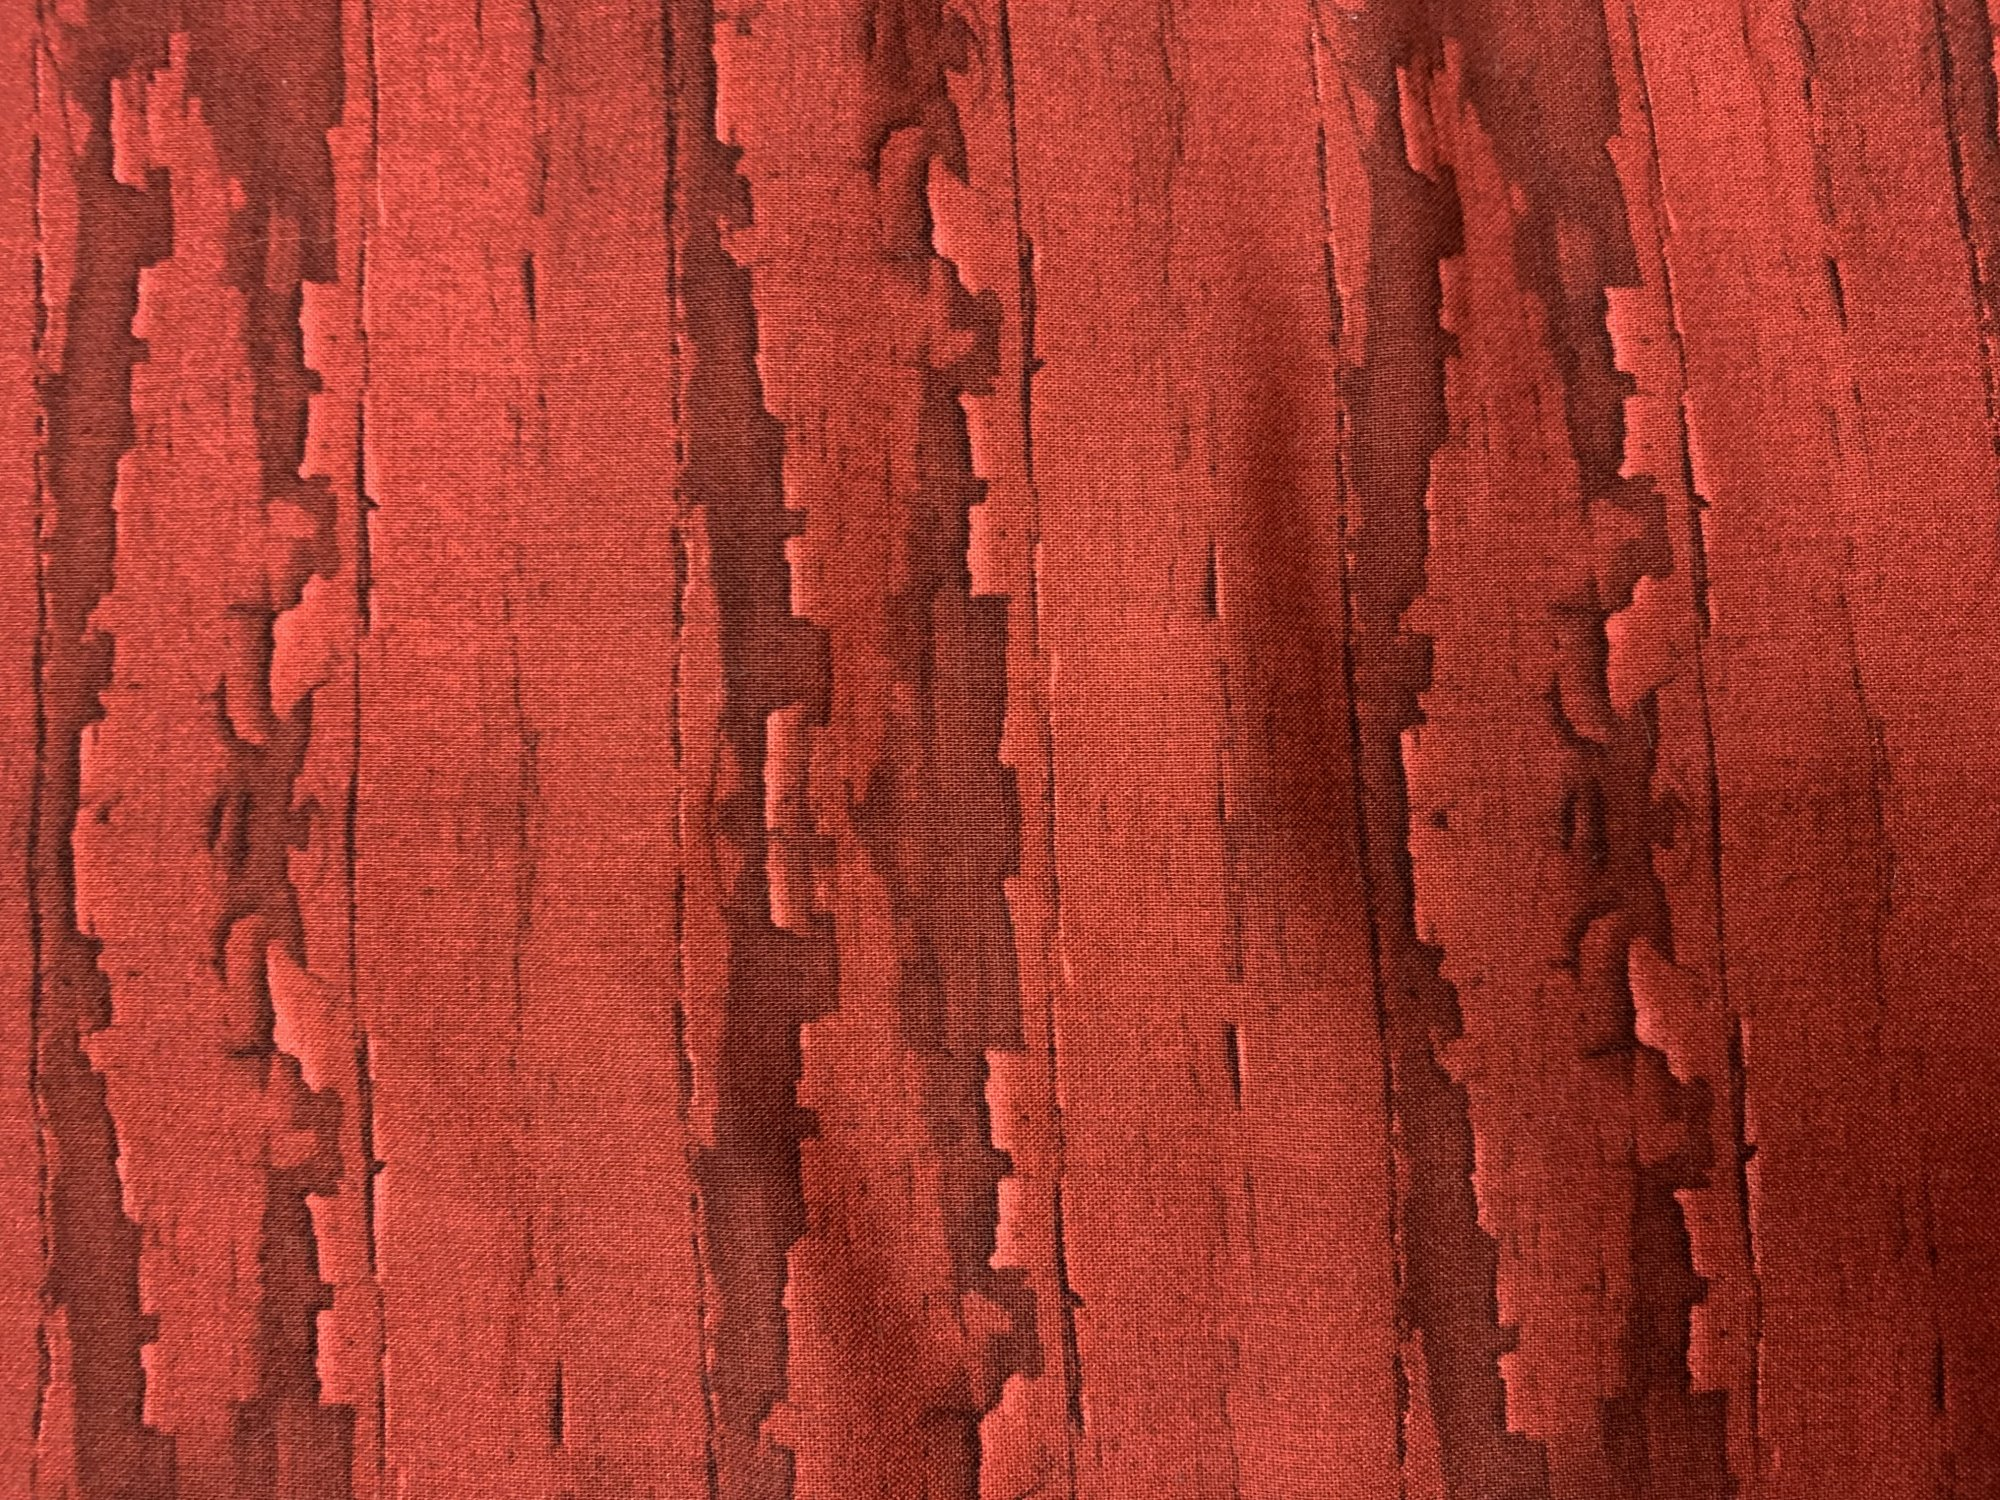 Burgundy Woods Boards/Wilmington/Farmstead